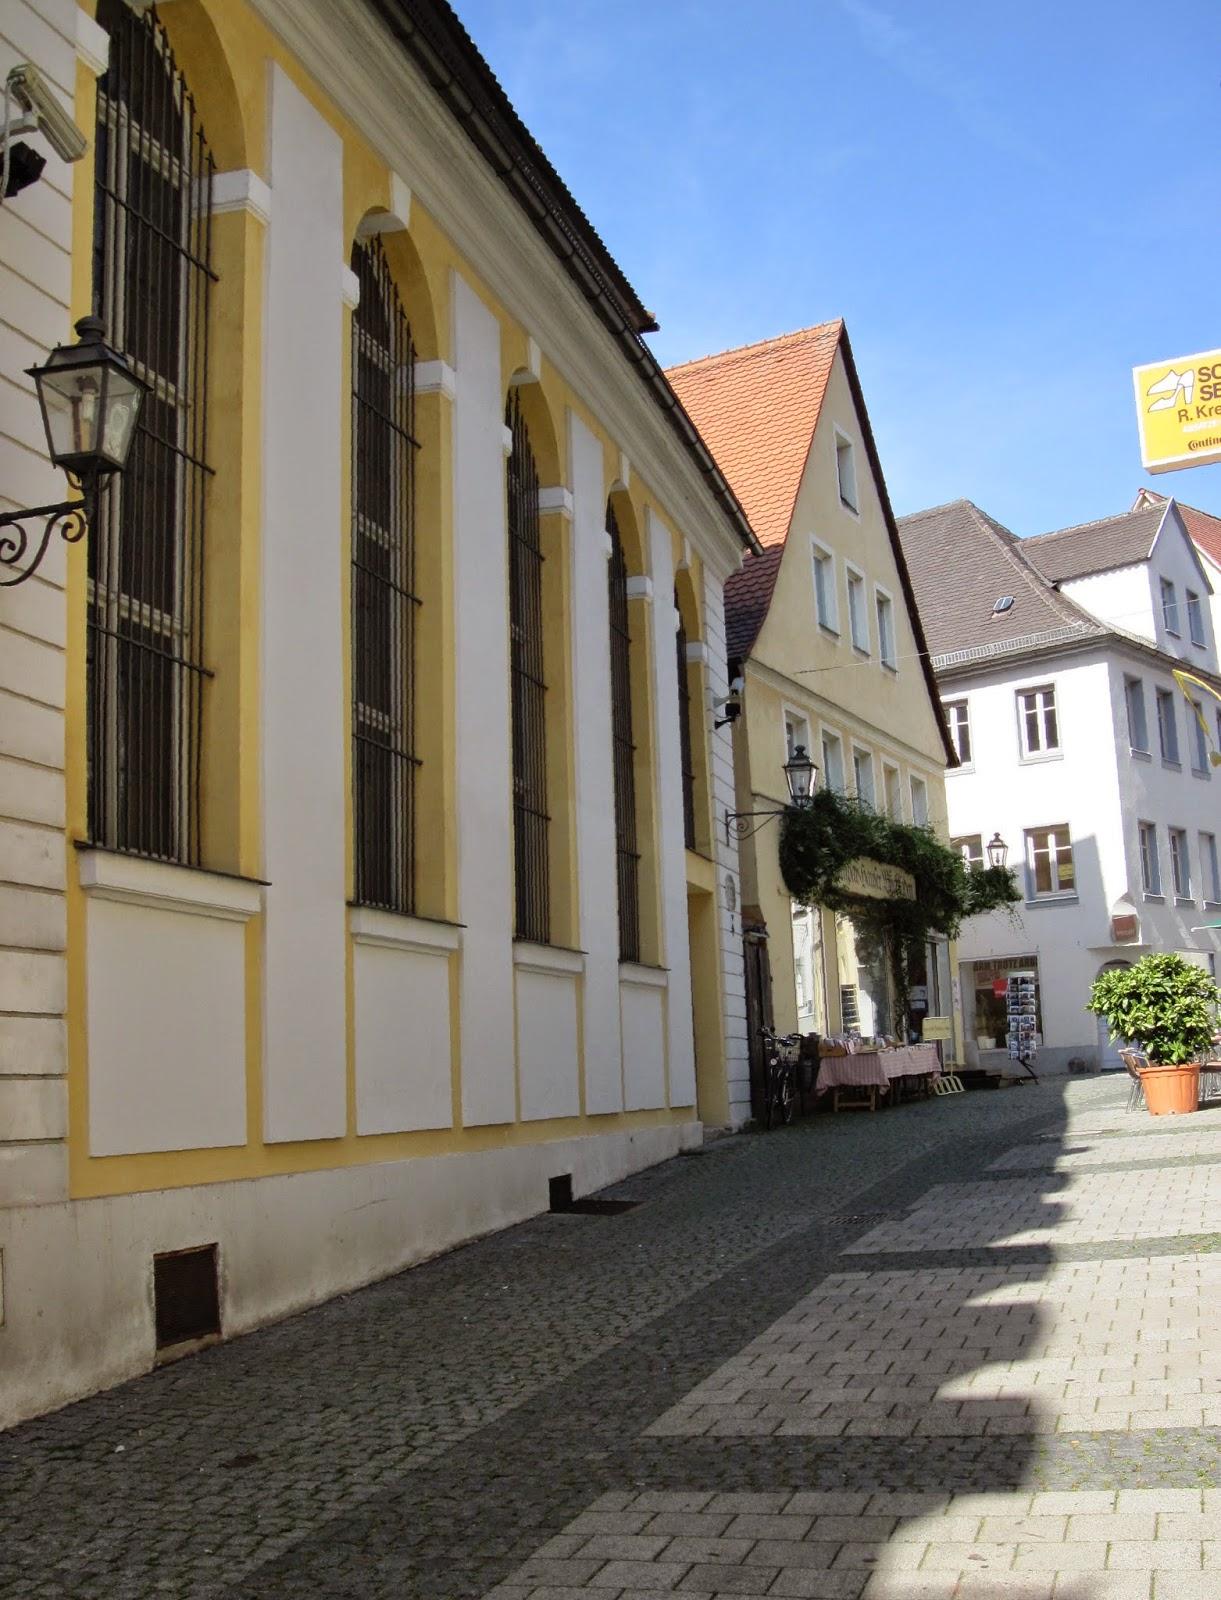 Ansbach zum kennenlernen